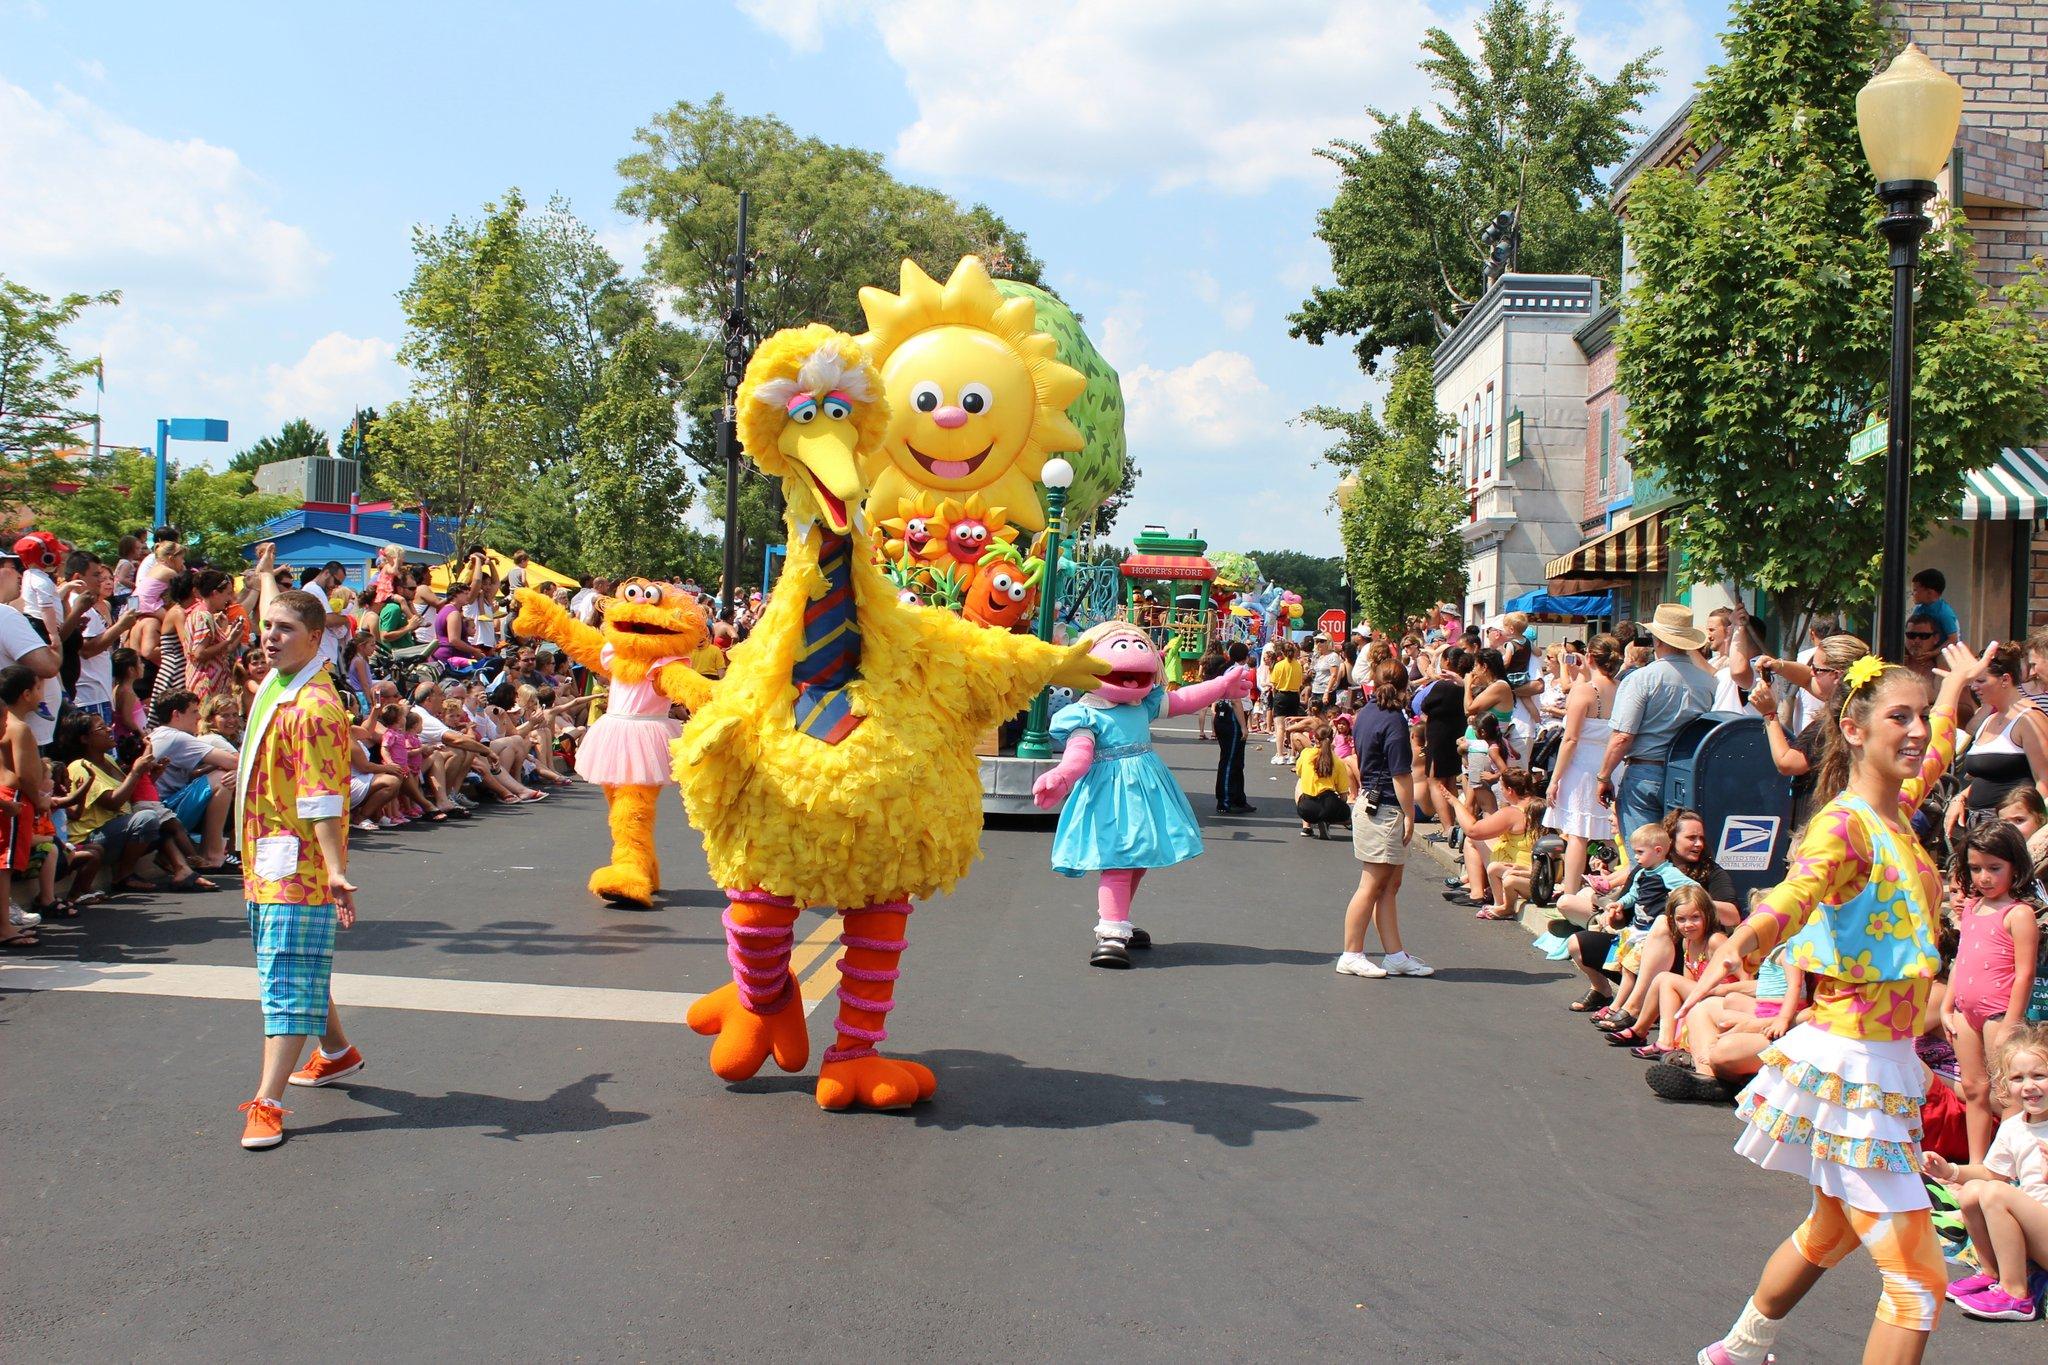 A parade featuring Big Bird at Sesame Place in Langhorne, Pennsylvania.